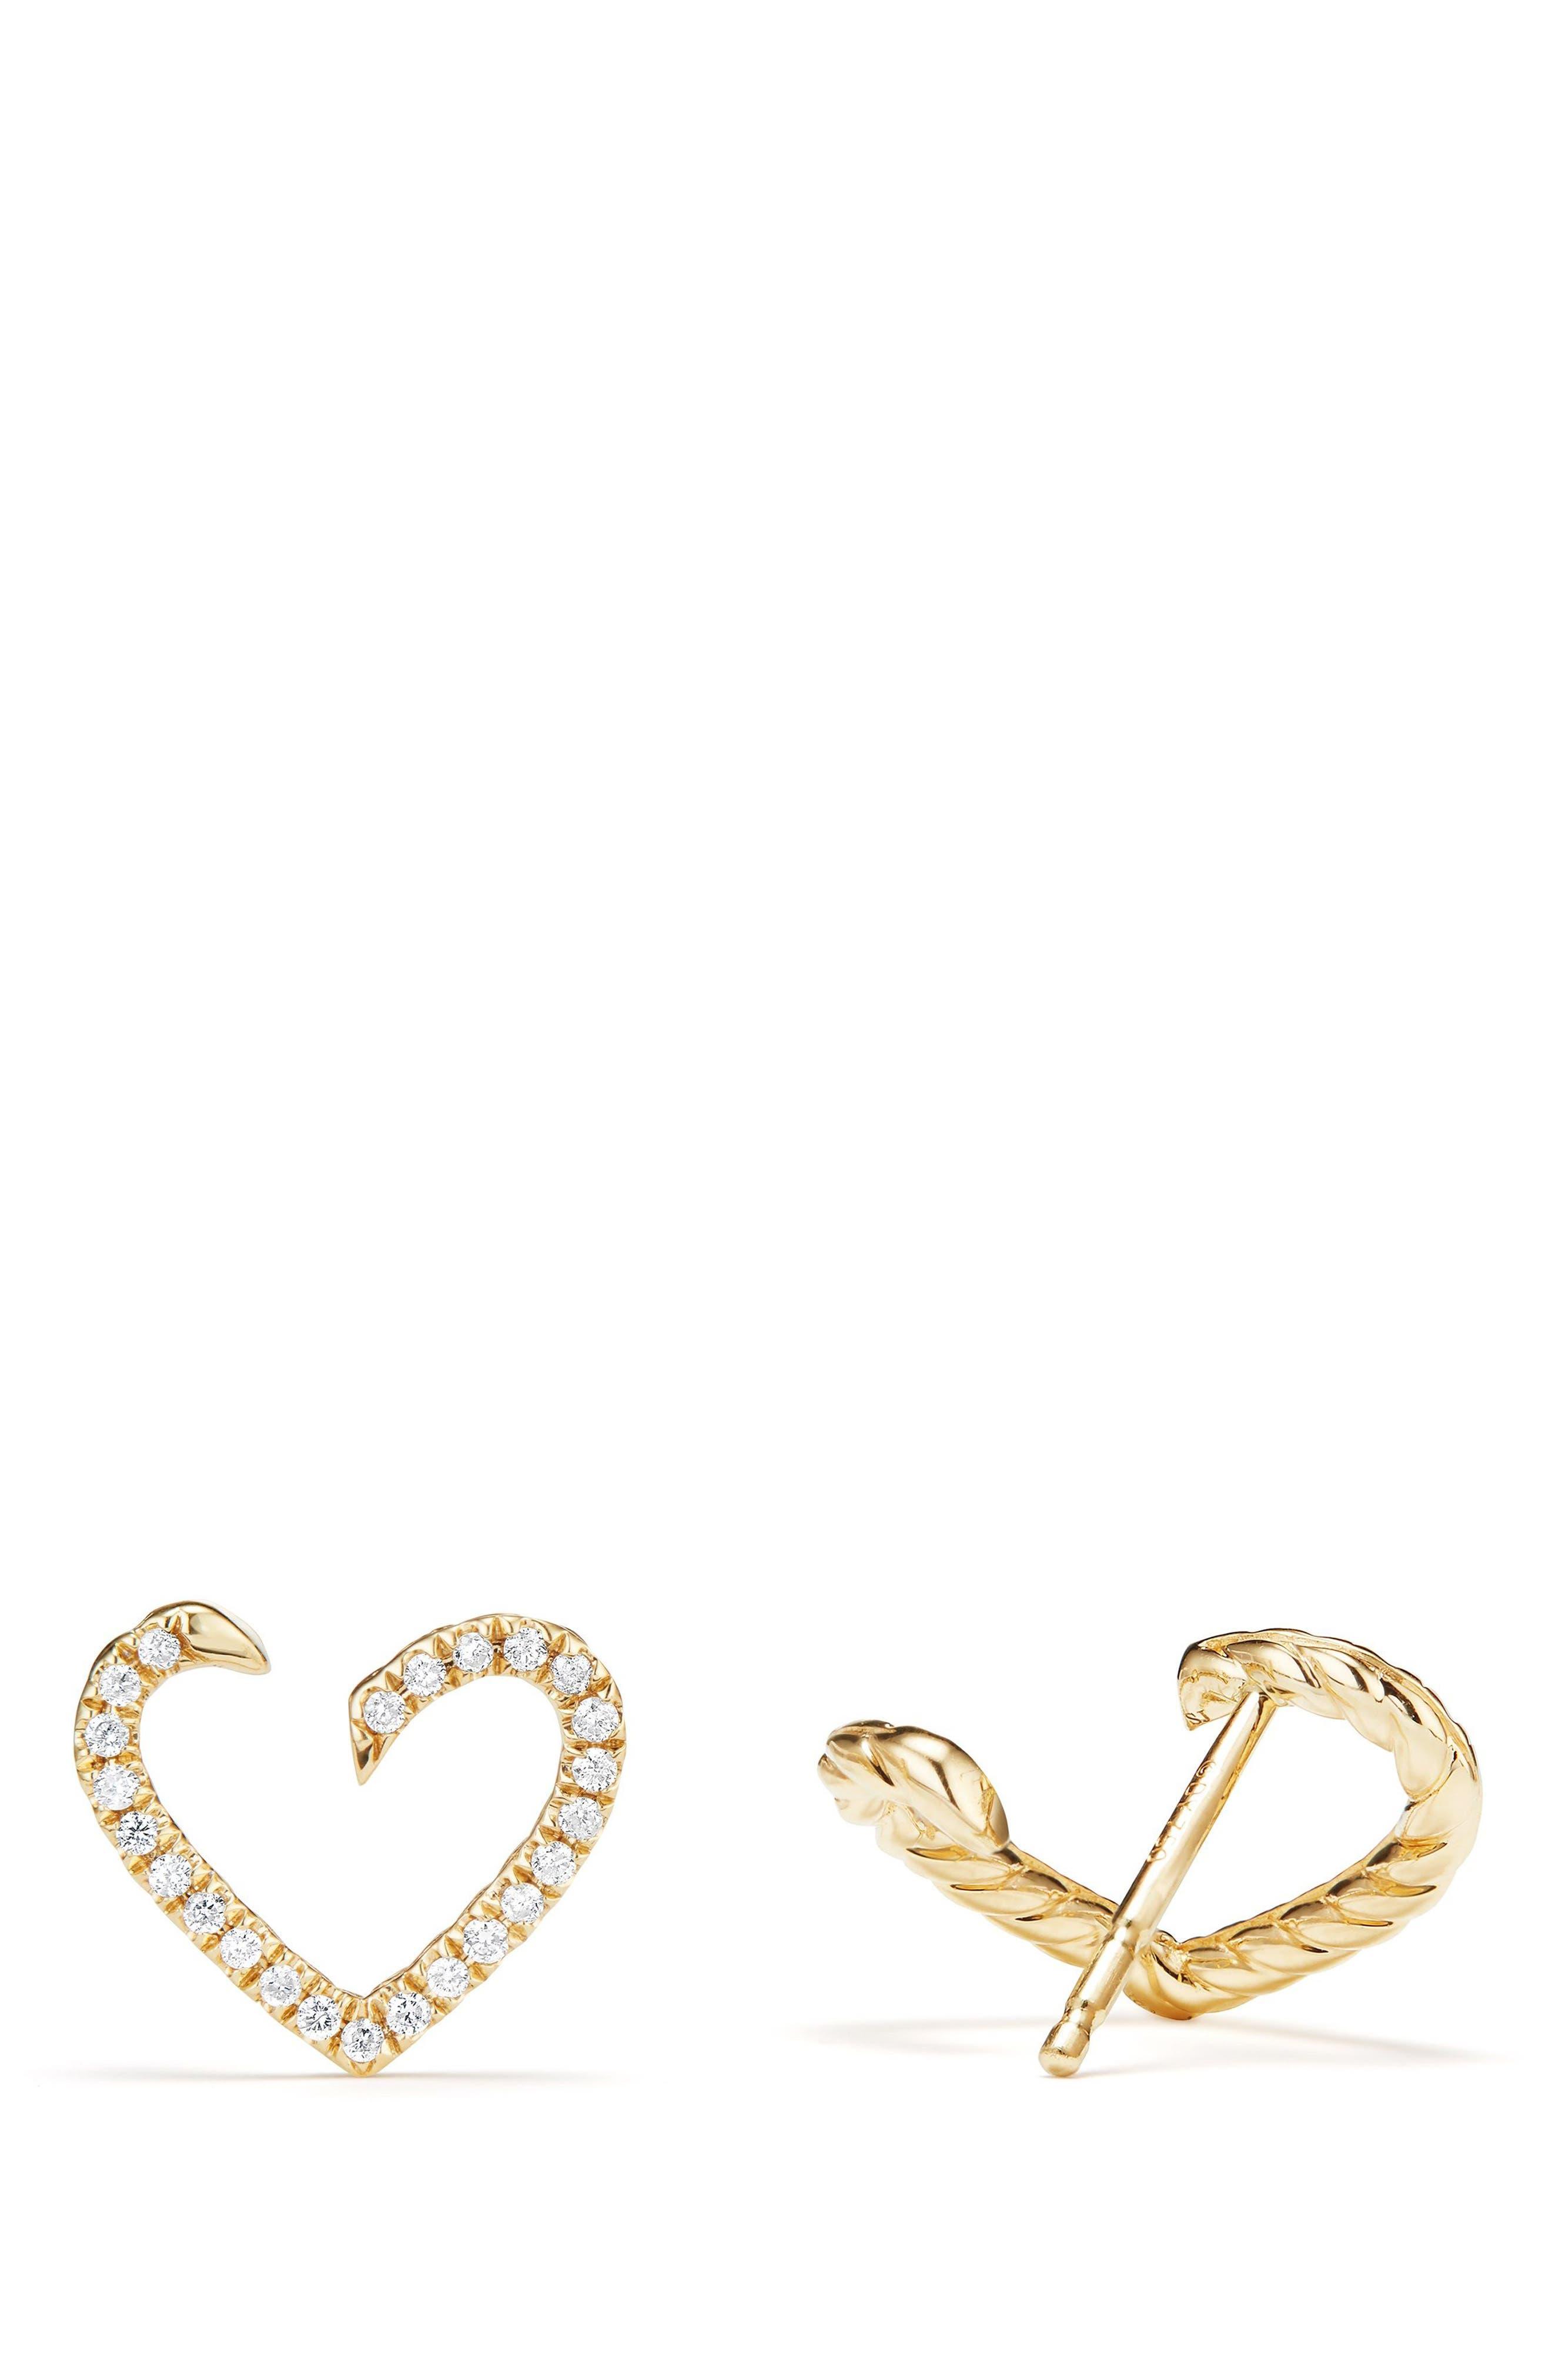 Heart Wrap Earrings with Diamonds in 18K Gold,                             Alternate thumbnail 2, color,                             GOLD/ DIAMOND